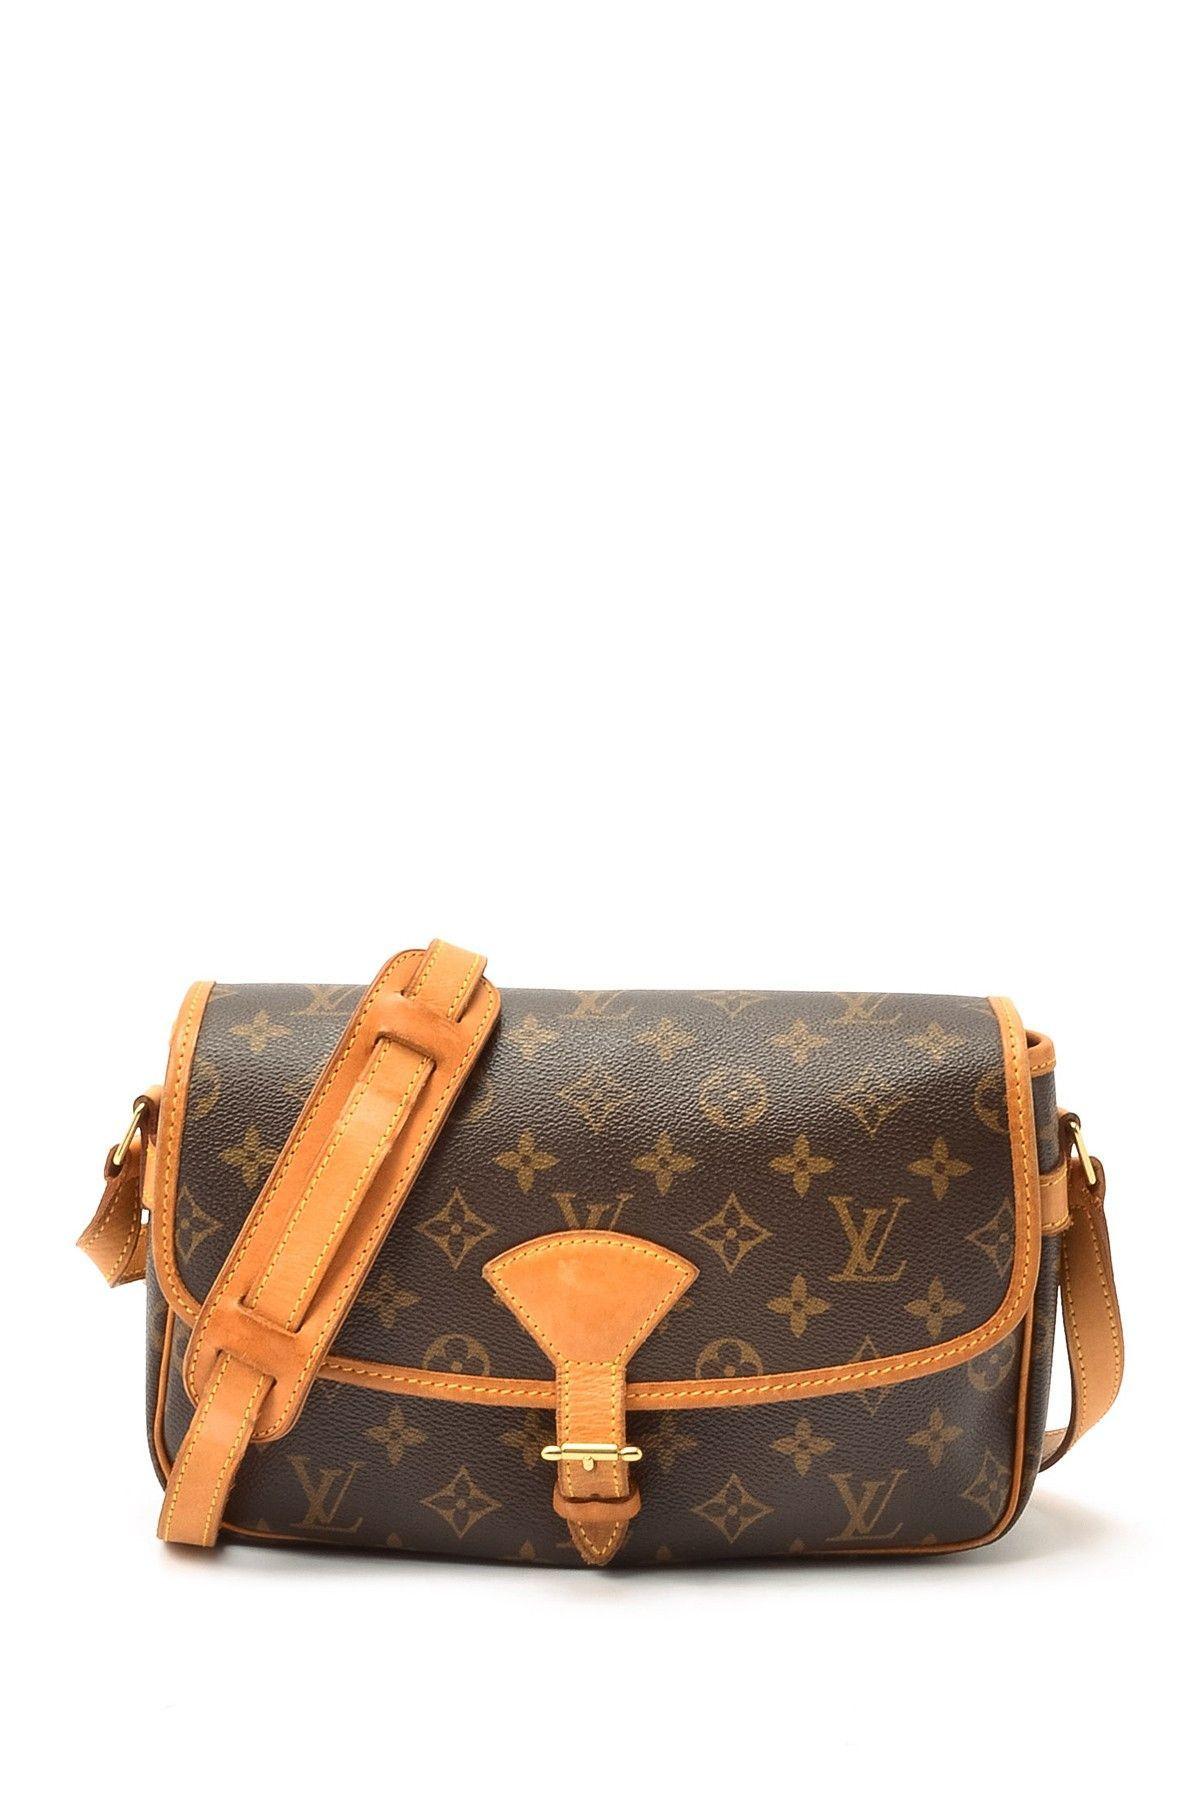 8fc8613fac13 Vintage Louis Vuitton Leather Sologne Crossbody Bag on HauteLook ...